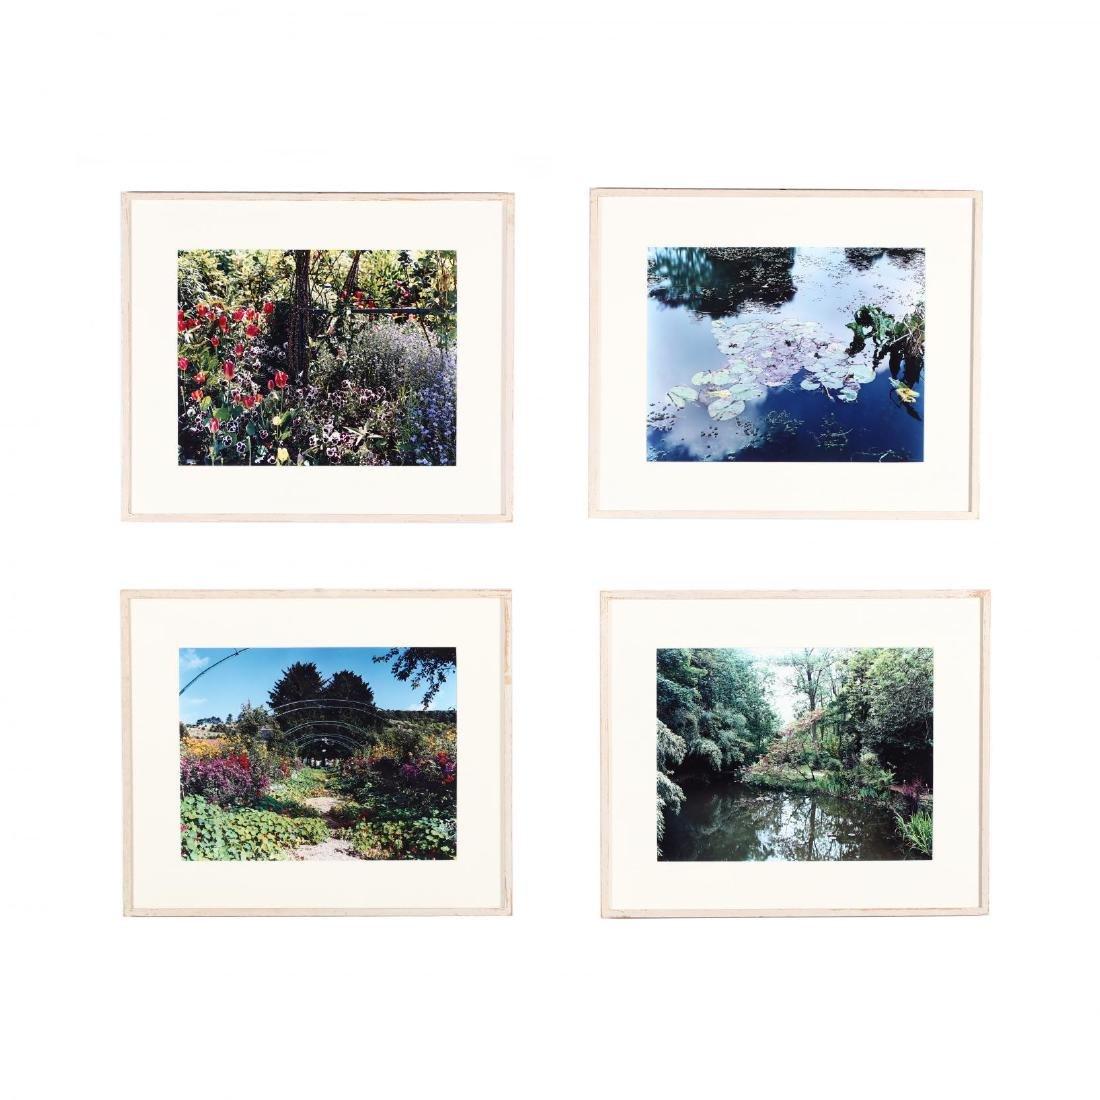 Stephen Shore (NY, b. 1947),  Monet's Garden